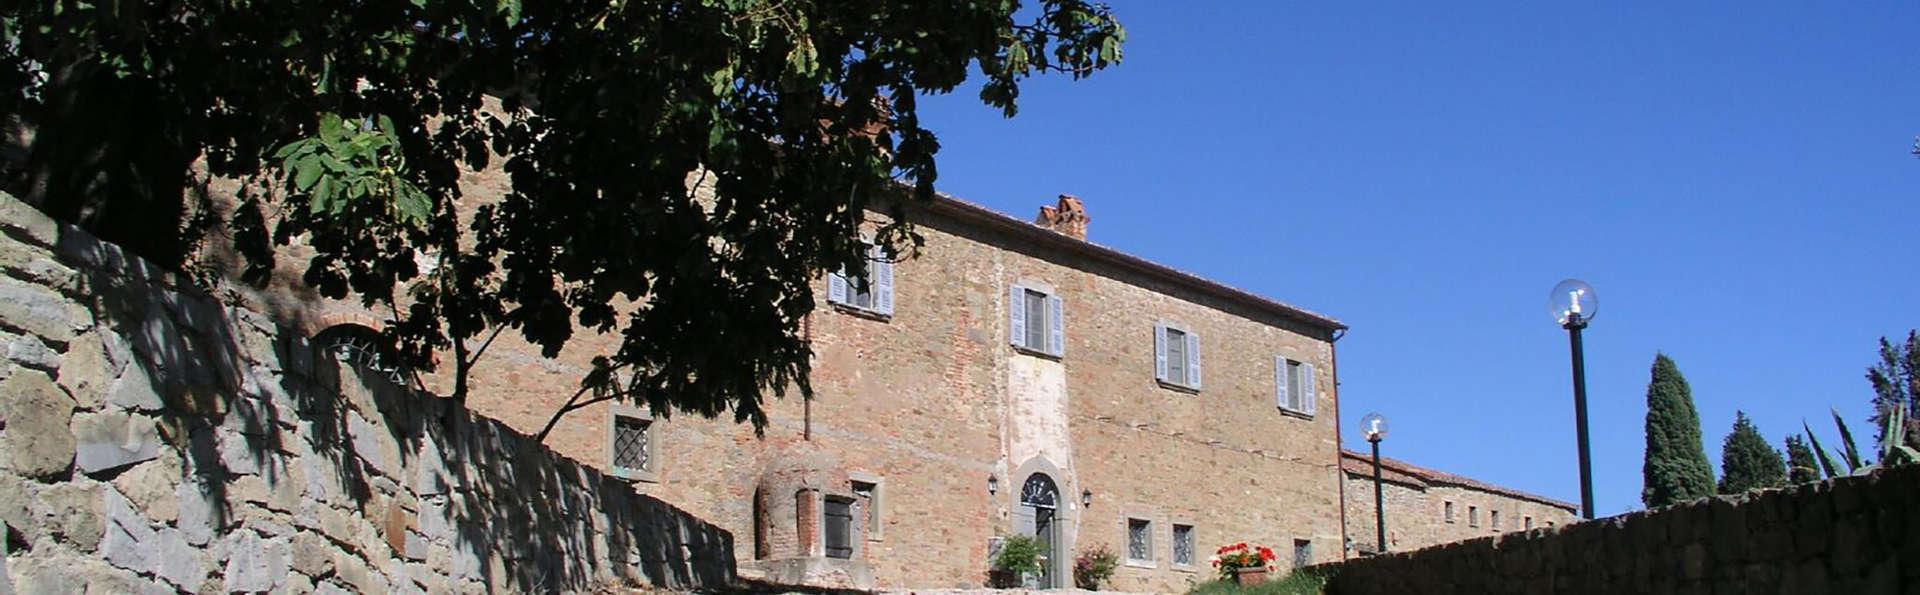 Antico Casale di Montegualandro - Edit_Front2.jpg